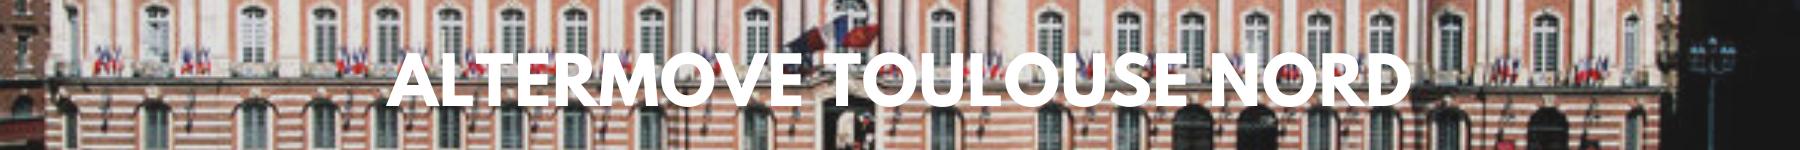 Magasin Altermove Toulouse nord vélo electrique velo pliant